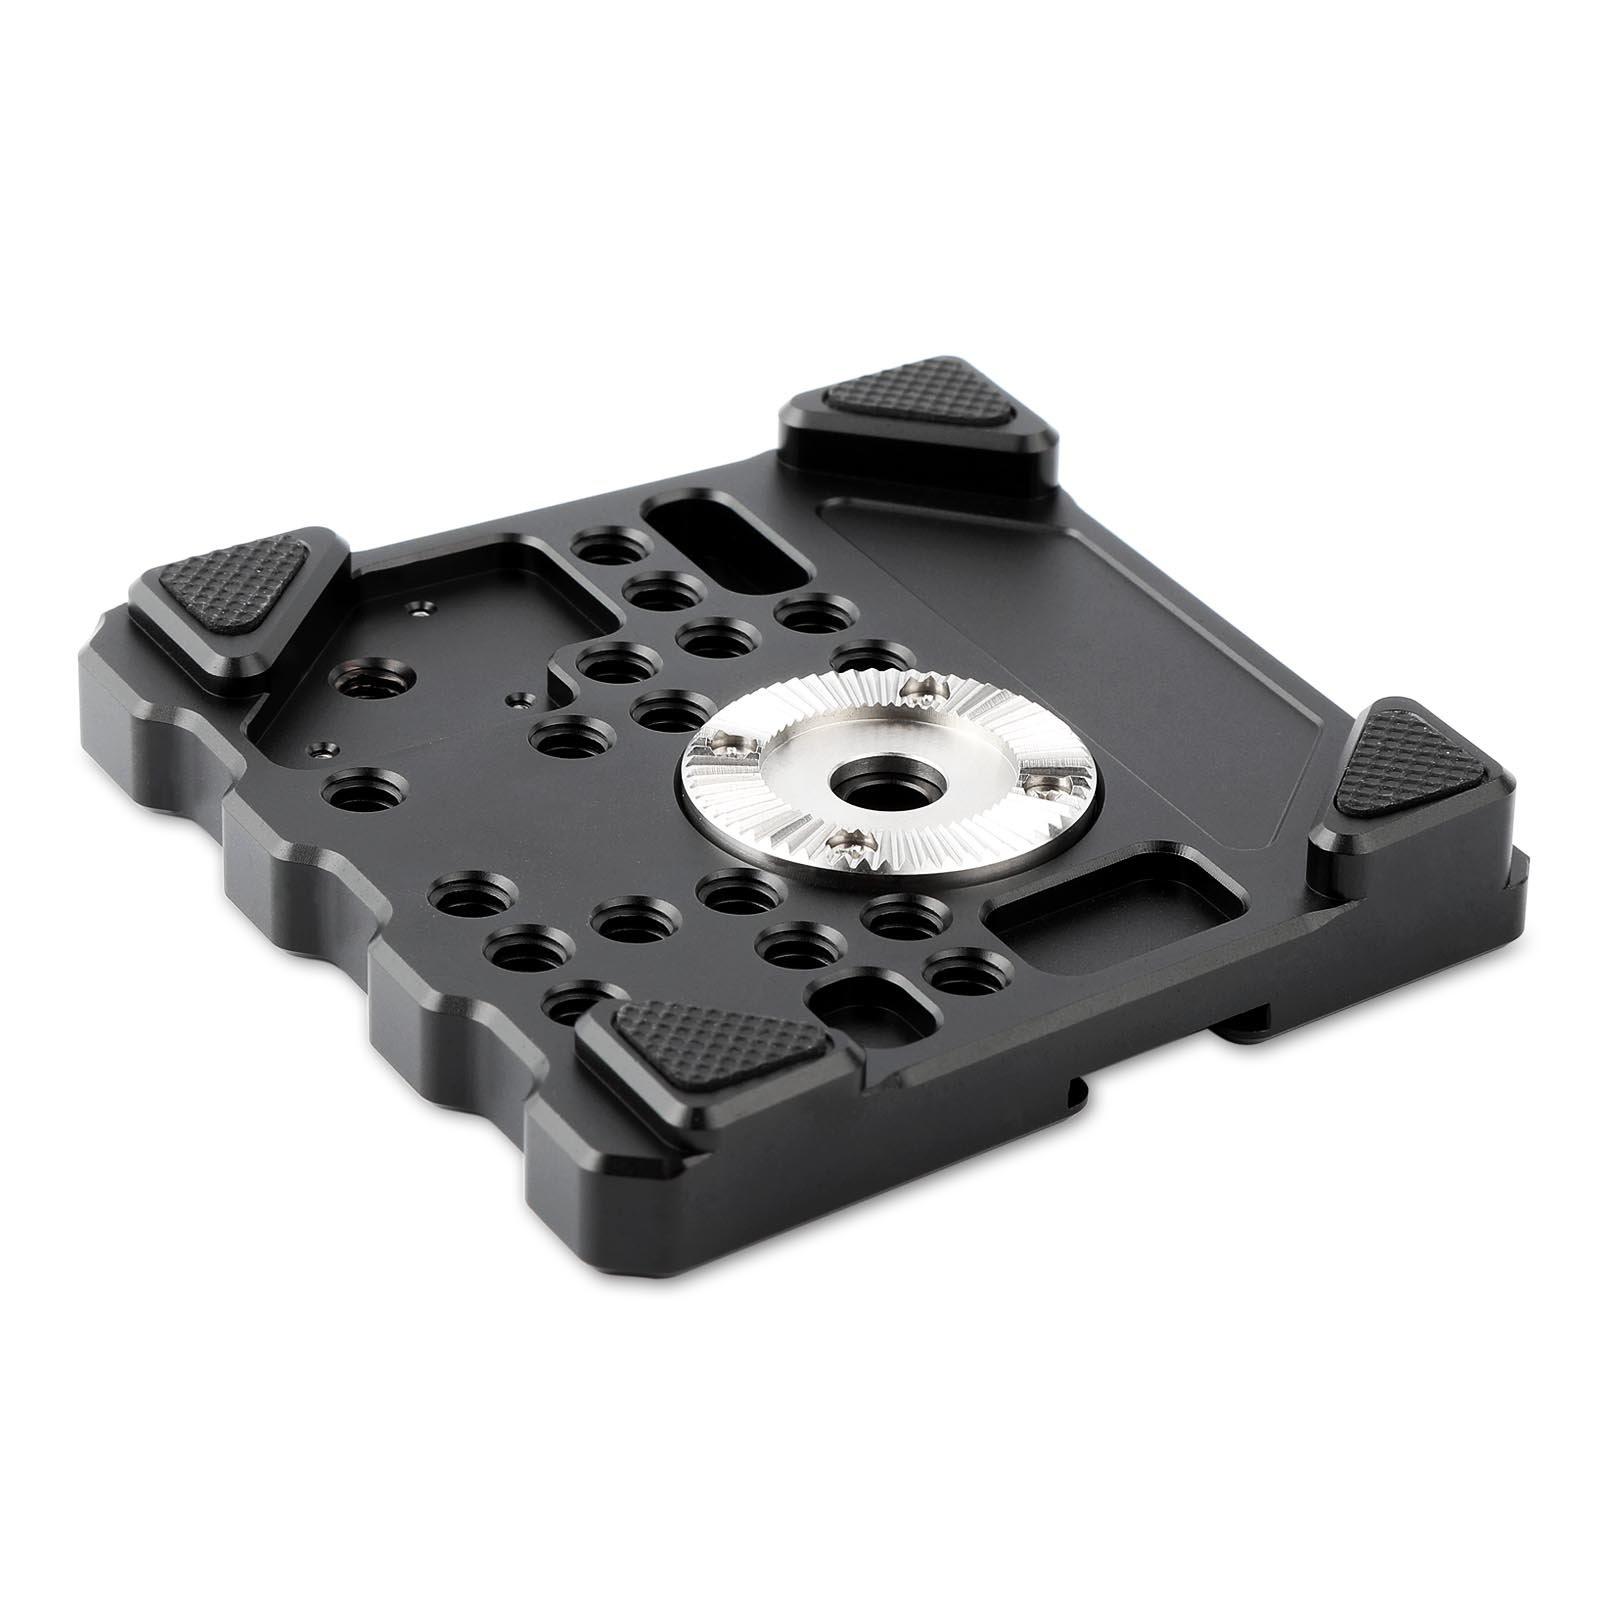 SMALLRIG Rosette Side Plate for BlackMagic URSA Mini, URSA Mini Pro Camera- 1854 by SmallRig (Image #5)